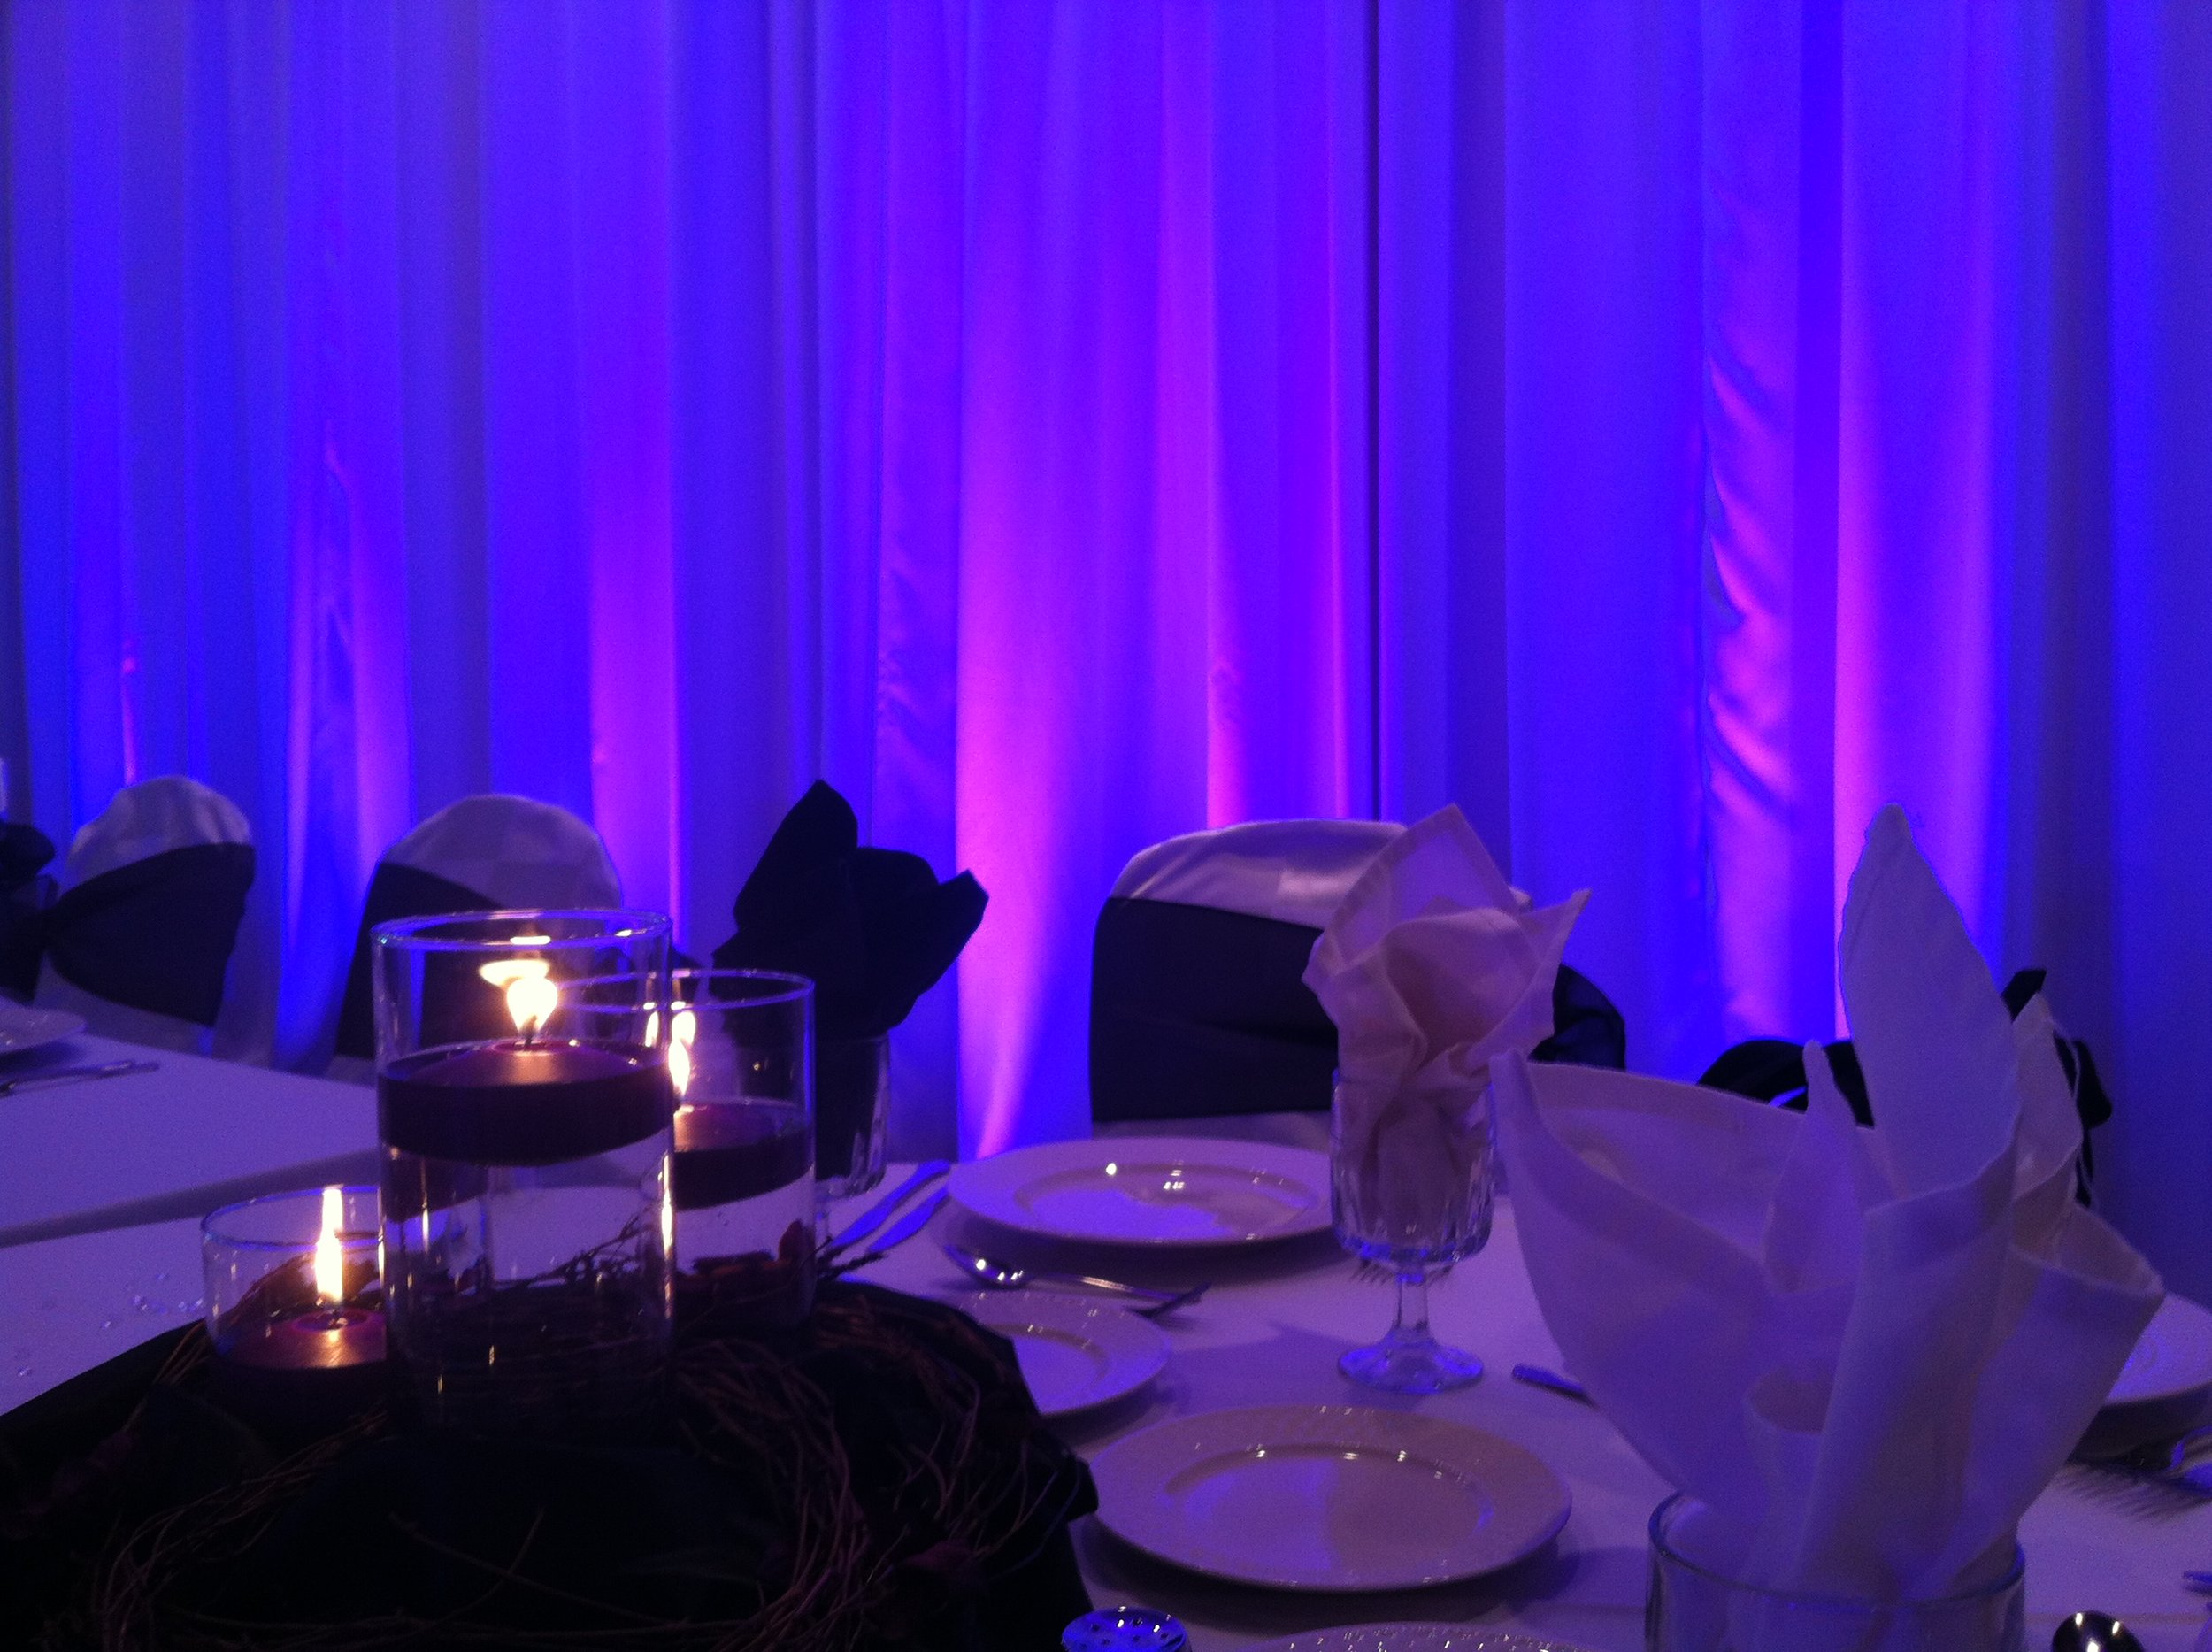 South Bend Purple Uplighting on drapery